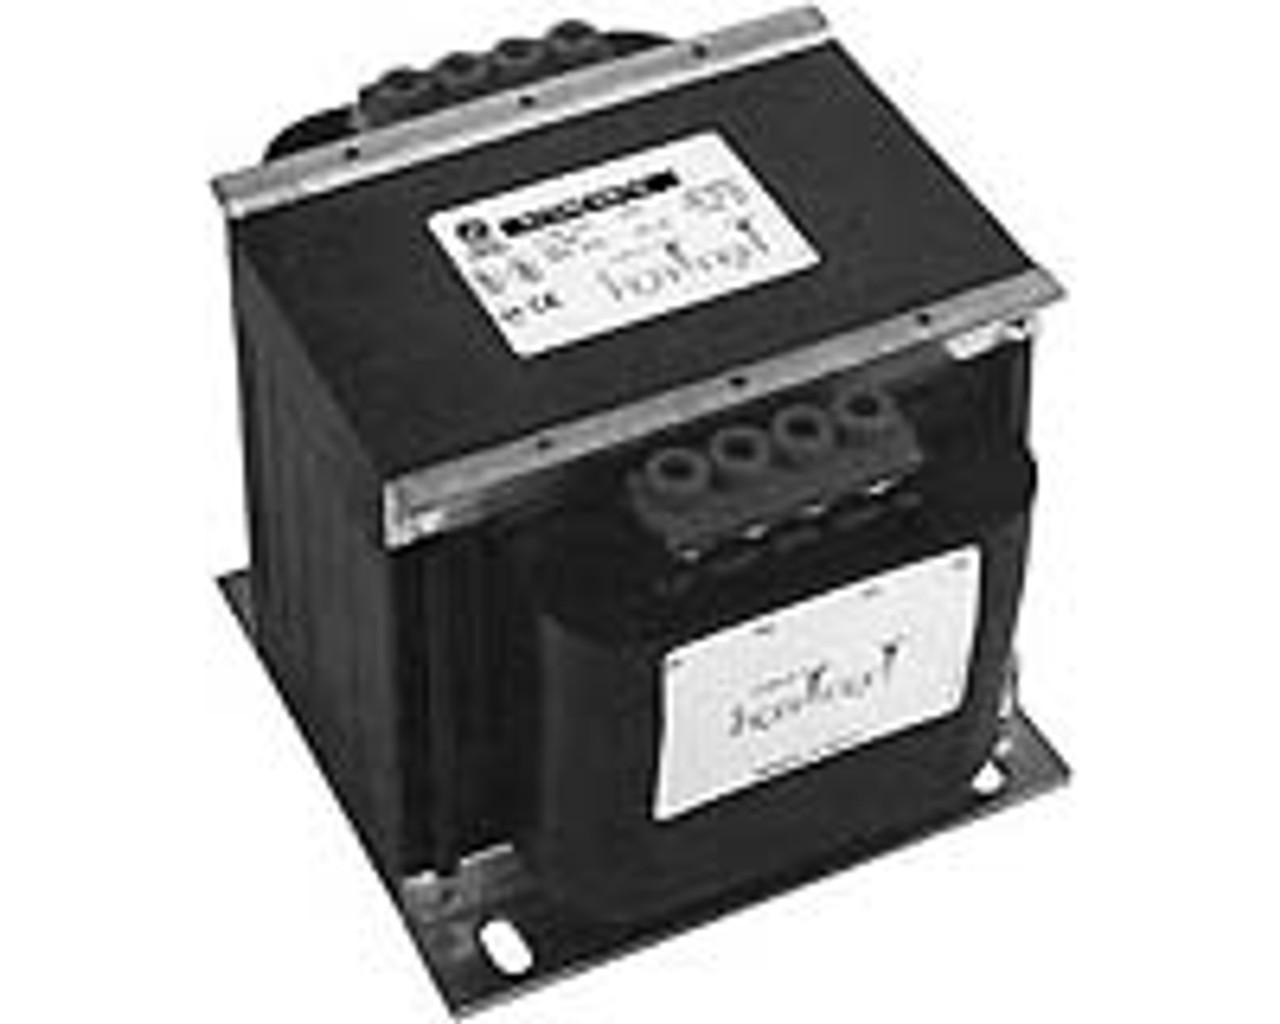 GE 9T58K0513G37 - 0.1 KVA 208 TO 120 VOLTS 1PH Transformer - New